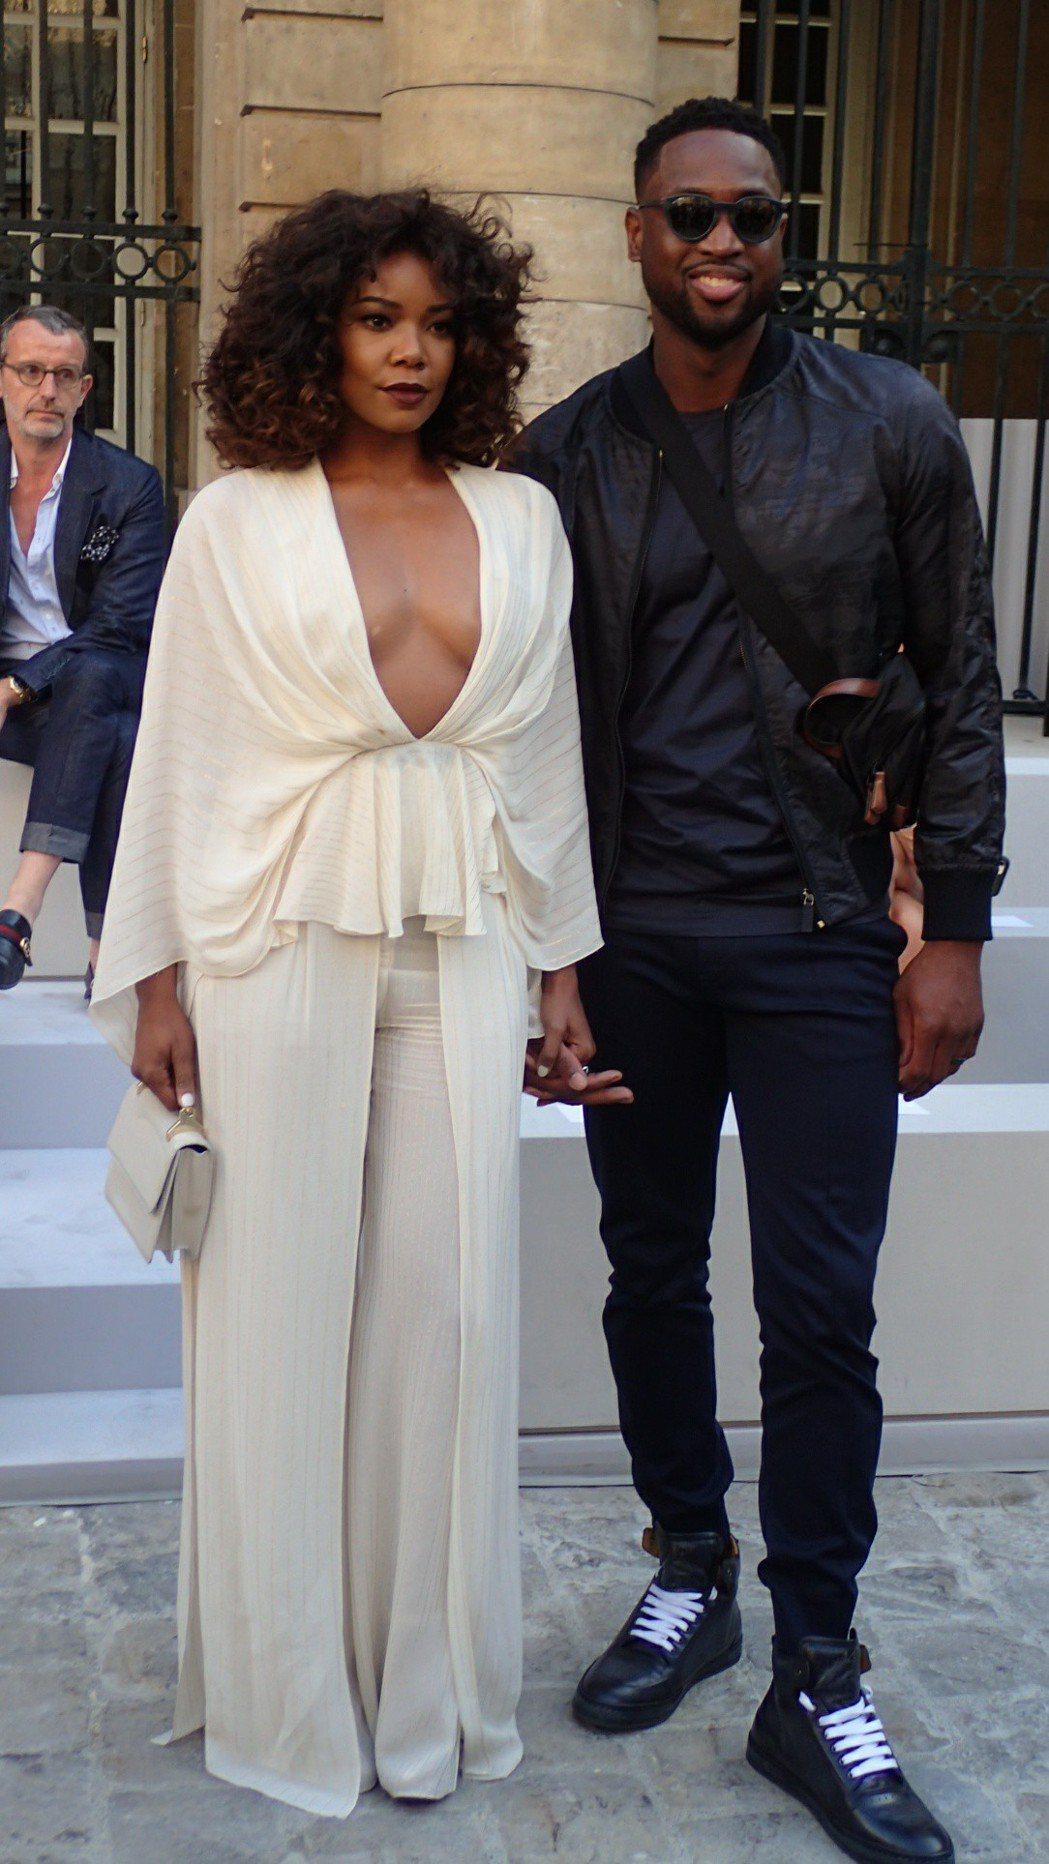 NBA球星Dwyane Wade帶著嬌妻一同出席Berluti 2018春夏服裝